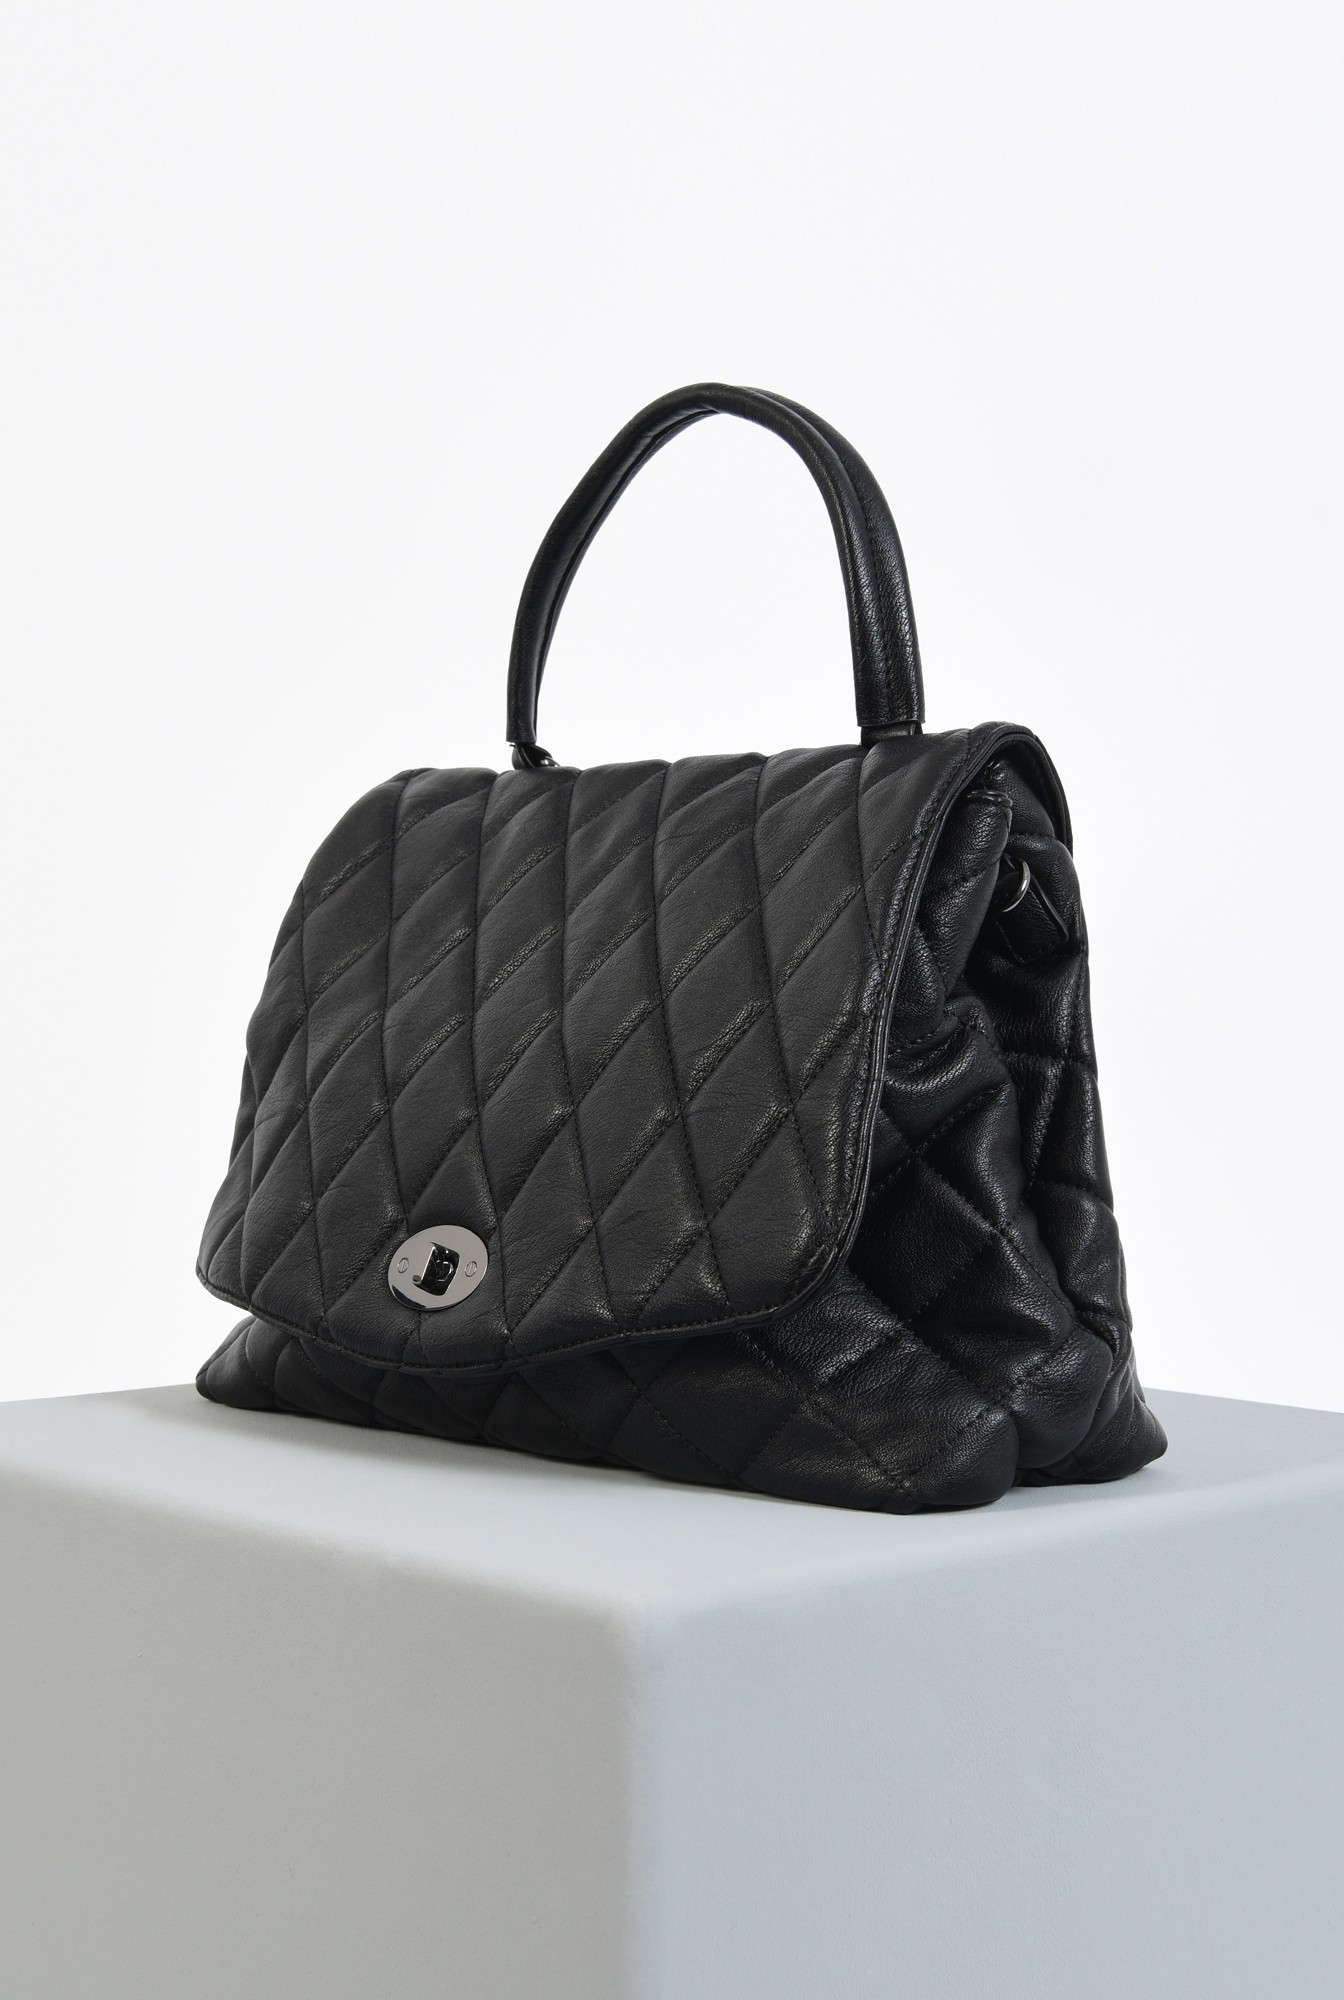 1 - geanta de mana, neagra, dimensiune mare, matlasata in V